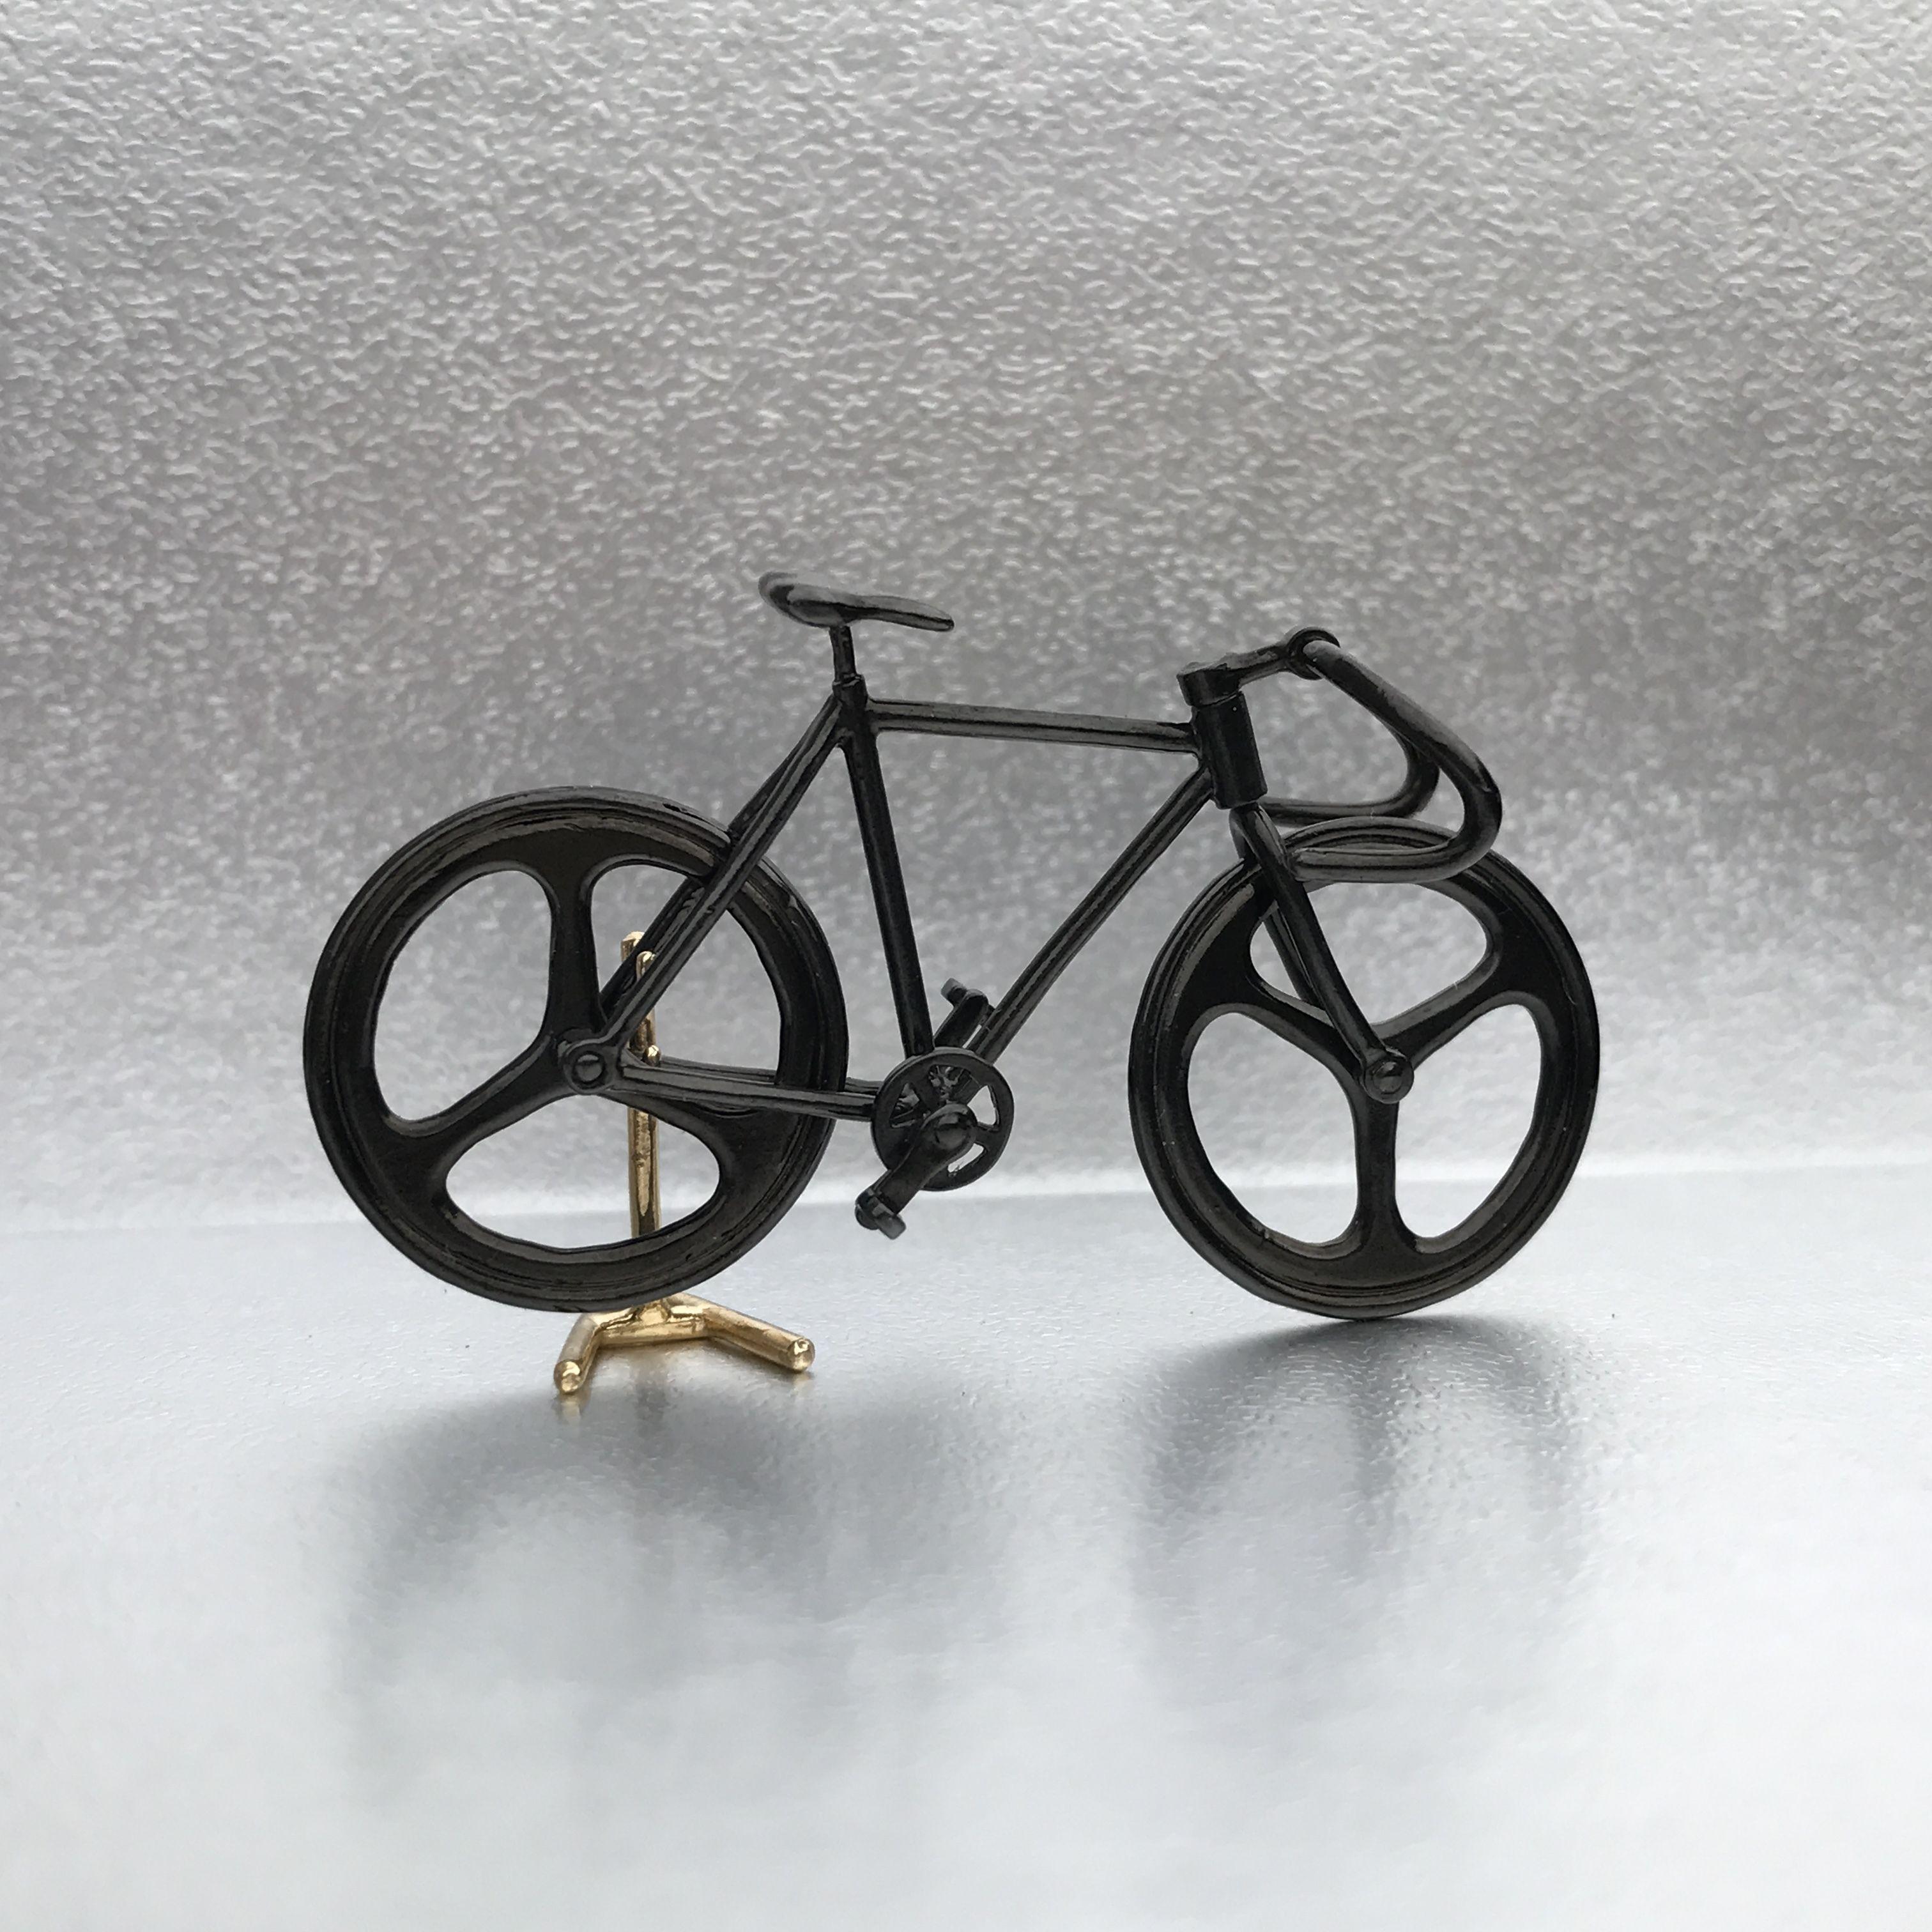 Bicycle pendant Drop handle - Black